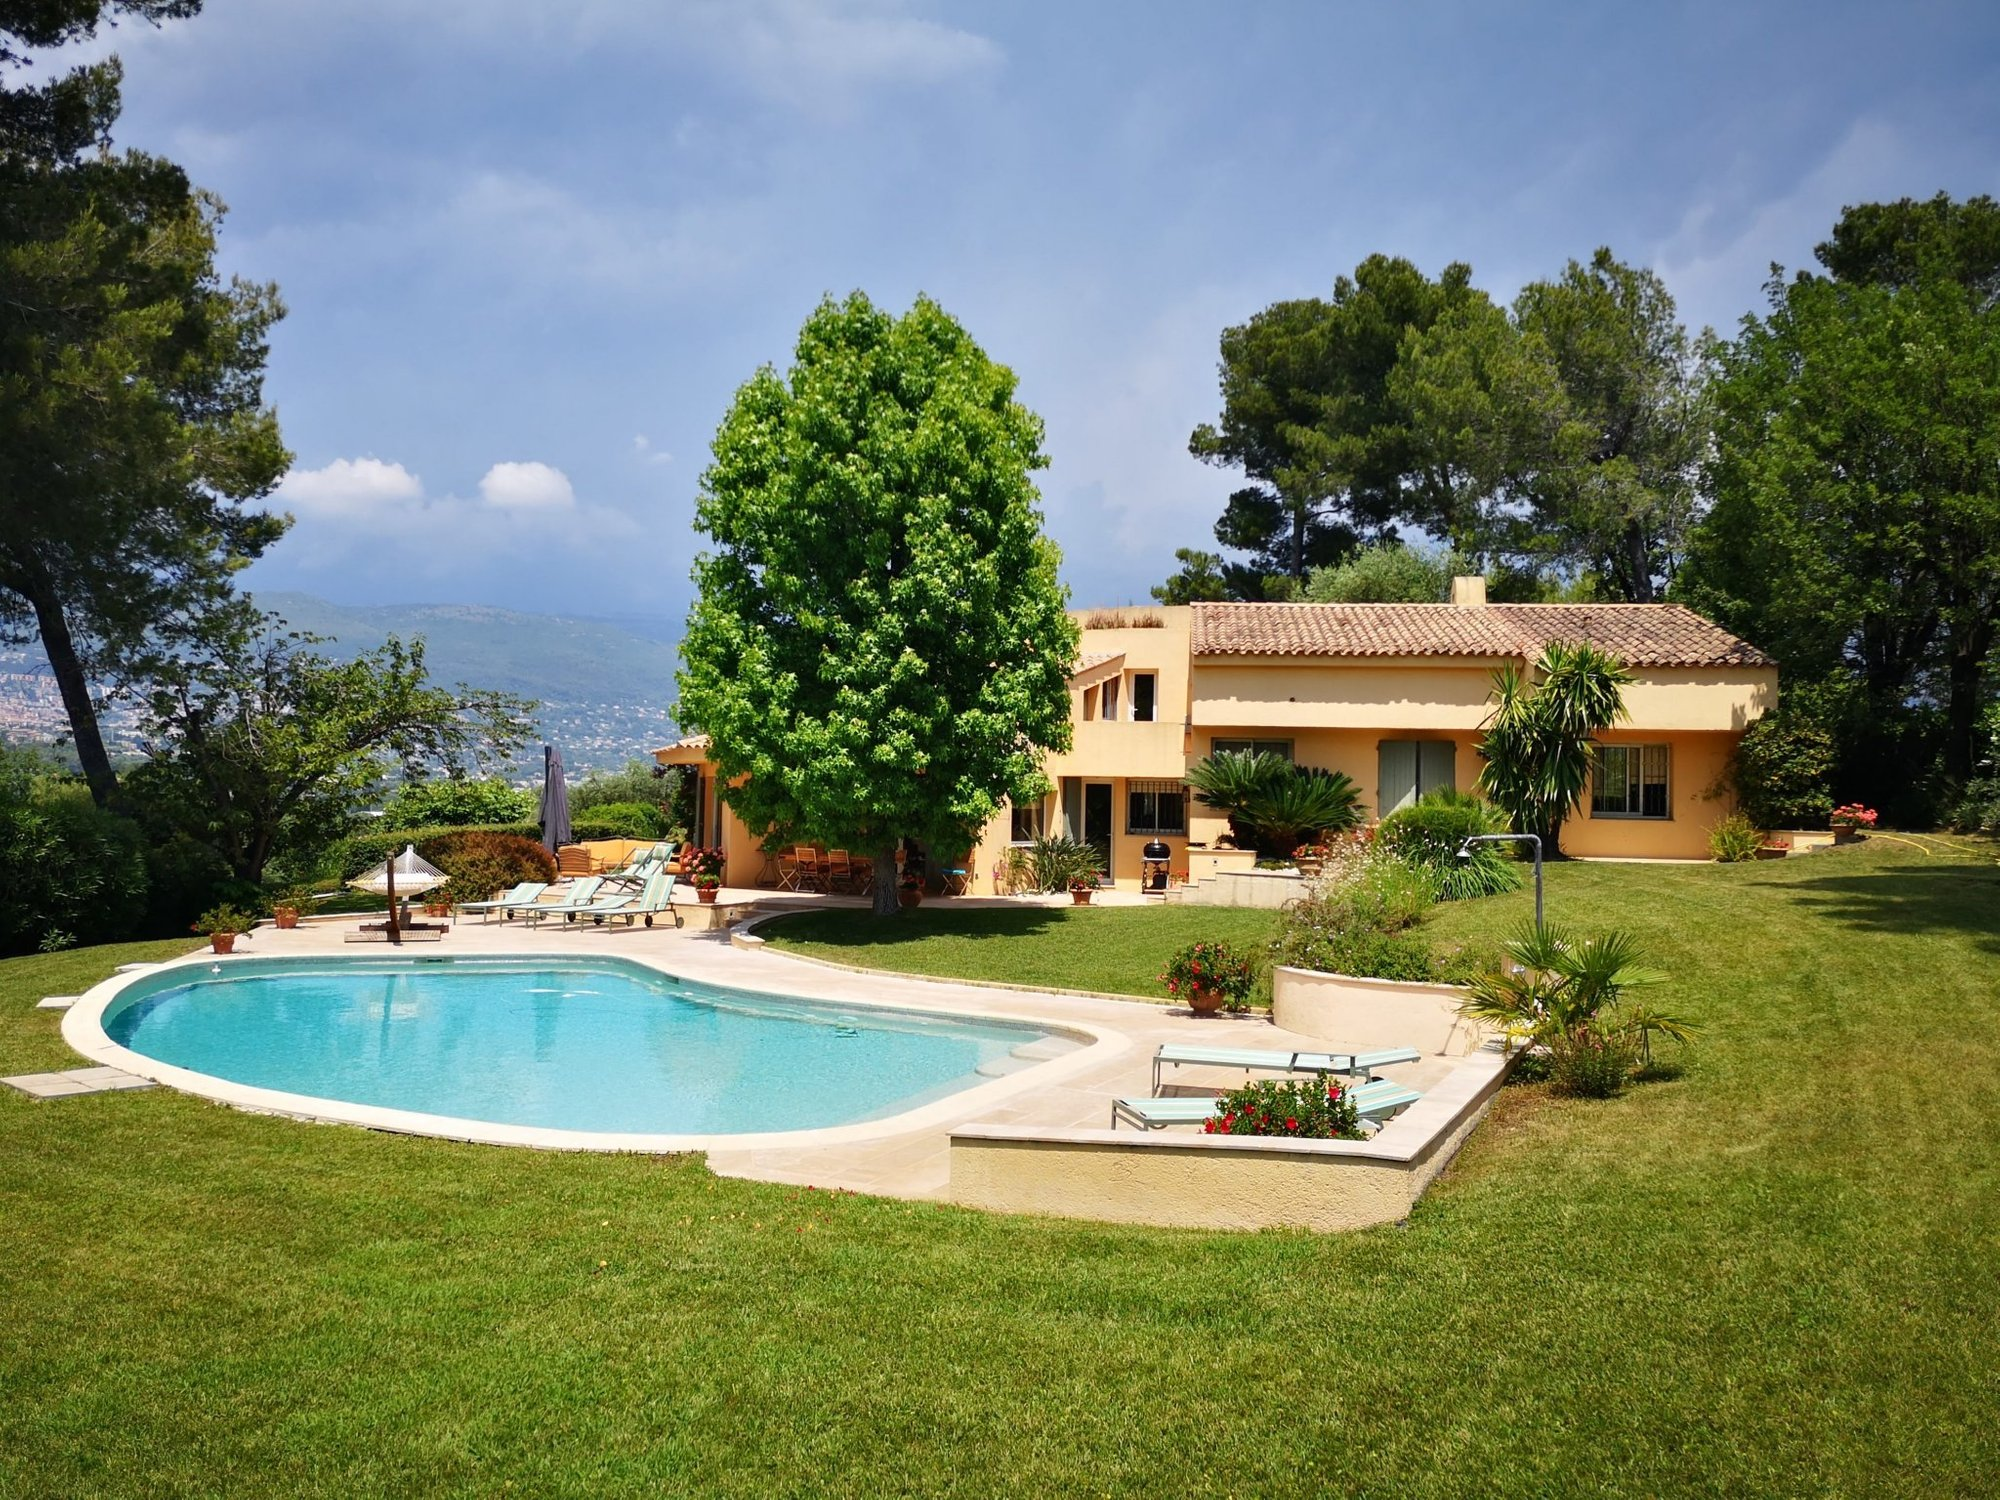 Villa in Nice, Provence-Alpes-Côte d'Azur, France 1 - 10971975